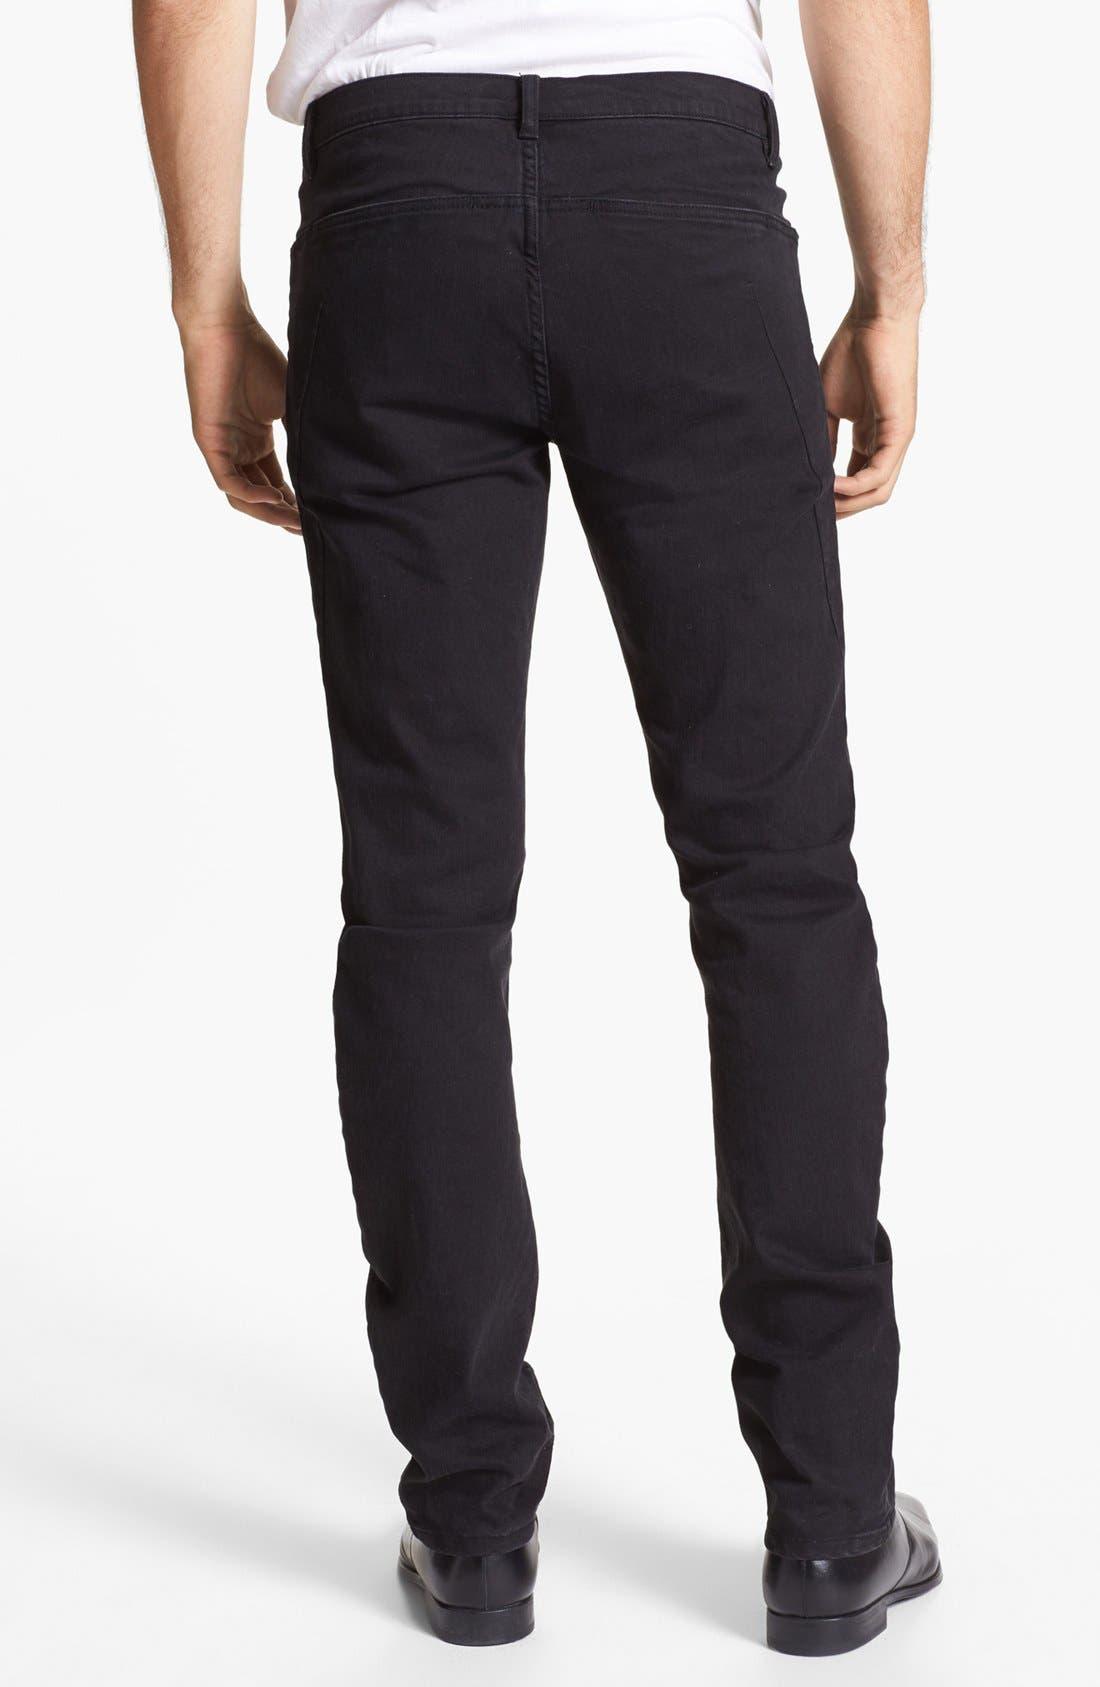 Alternate Image 2  - Kenneth Cole Collection Slim Fit Jeans (Black)